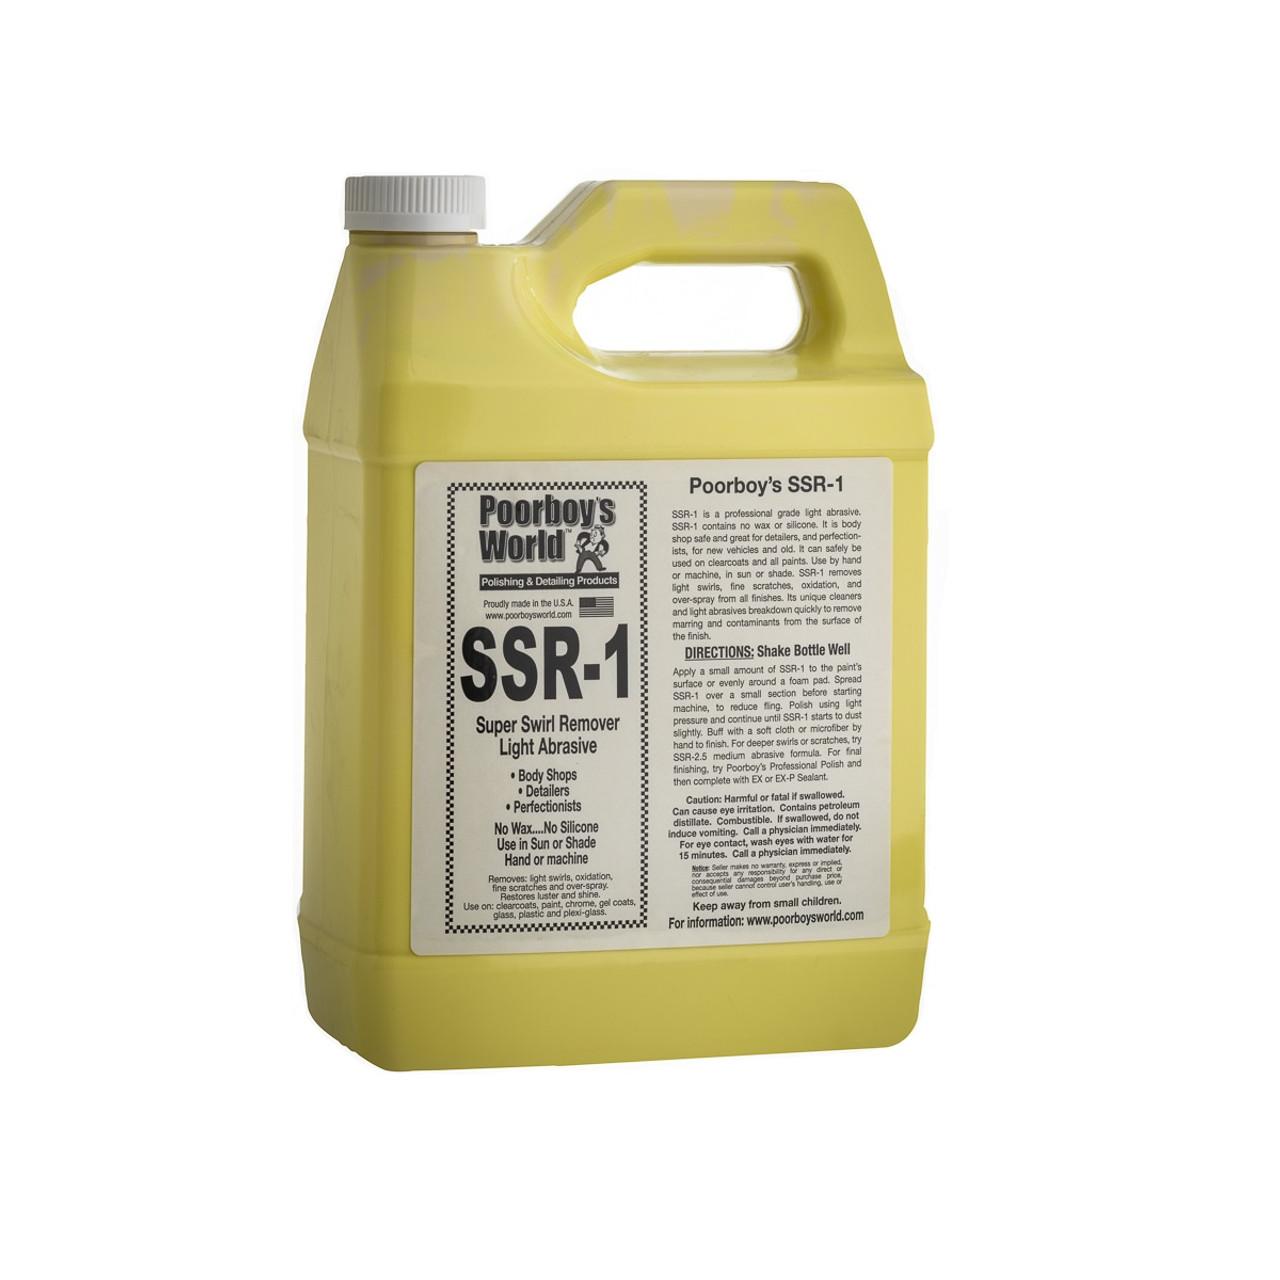 Poorboy's World SSR-1 Super Swirl Remover Gallon